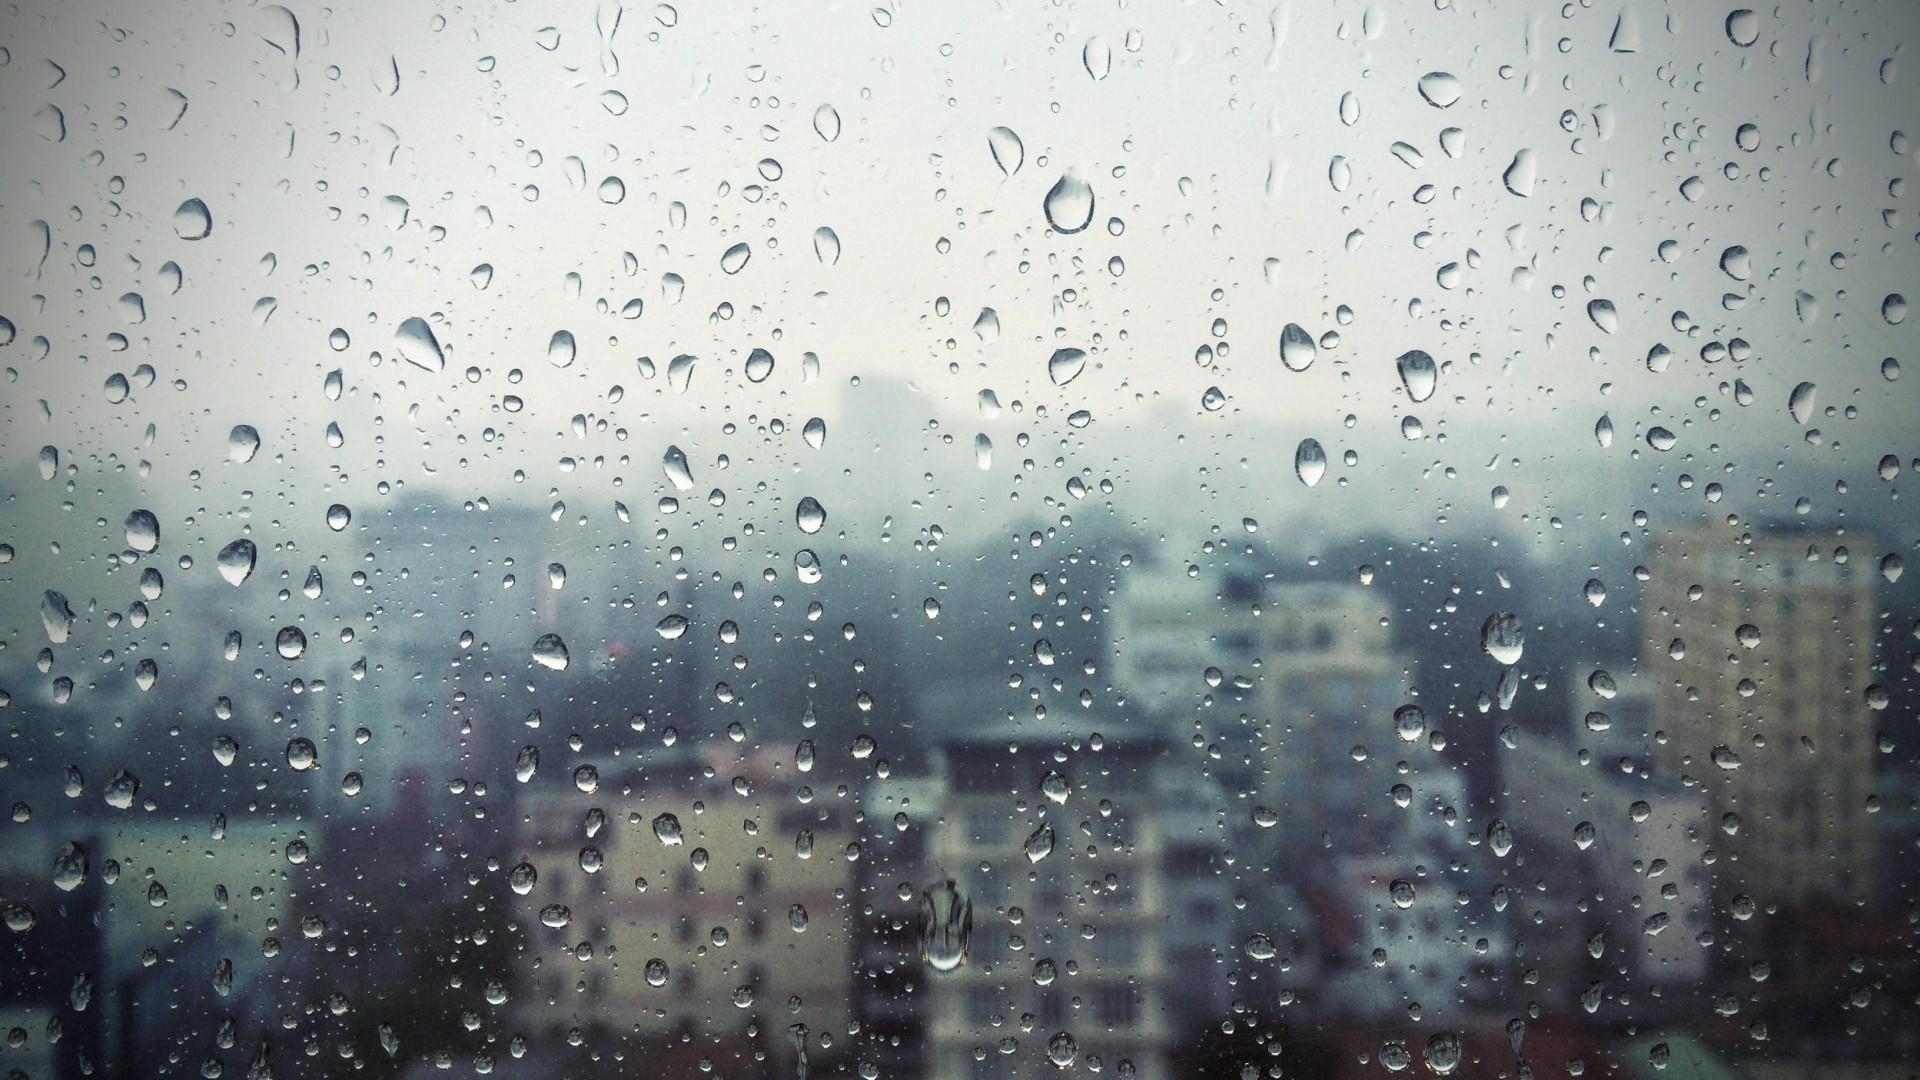 Rain on window wallpaper wallpapertag - Rainy window wallpaper ...